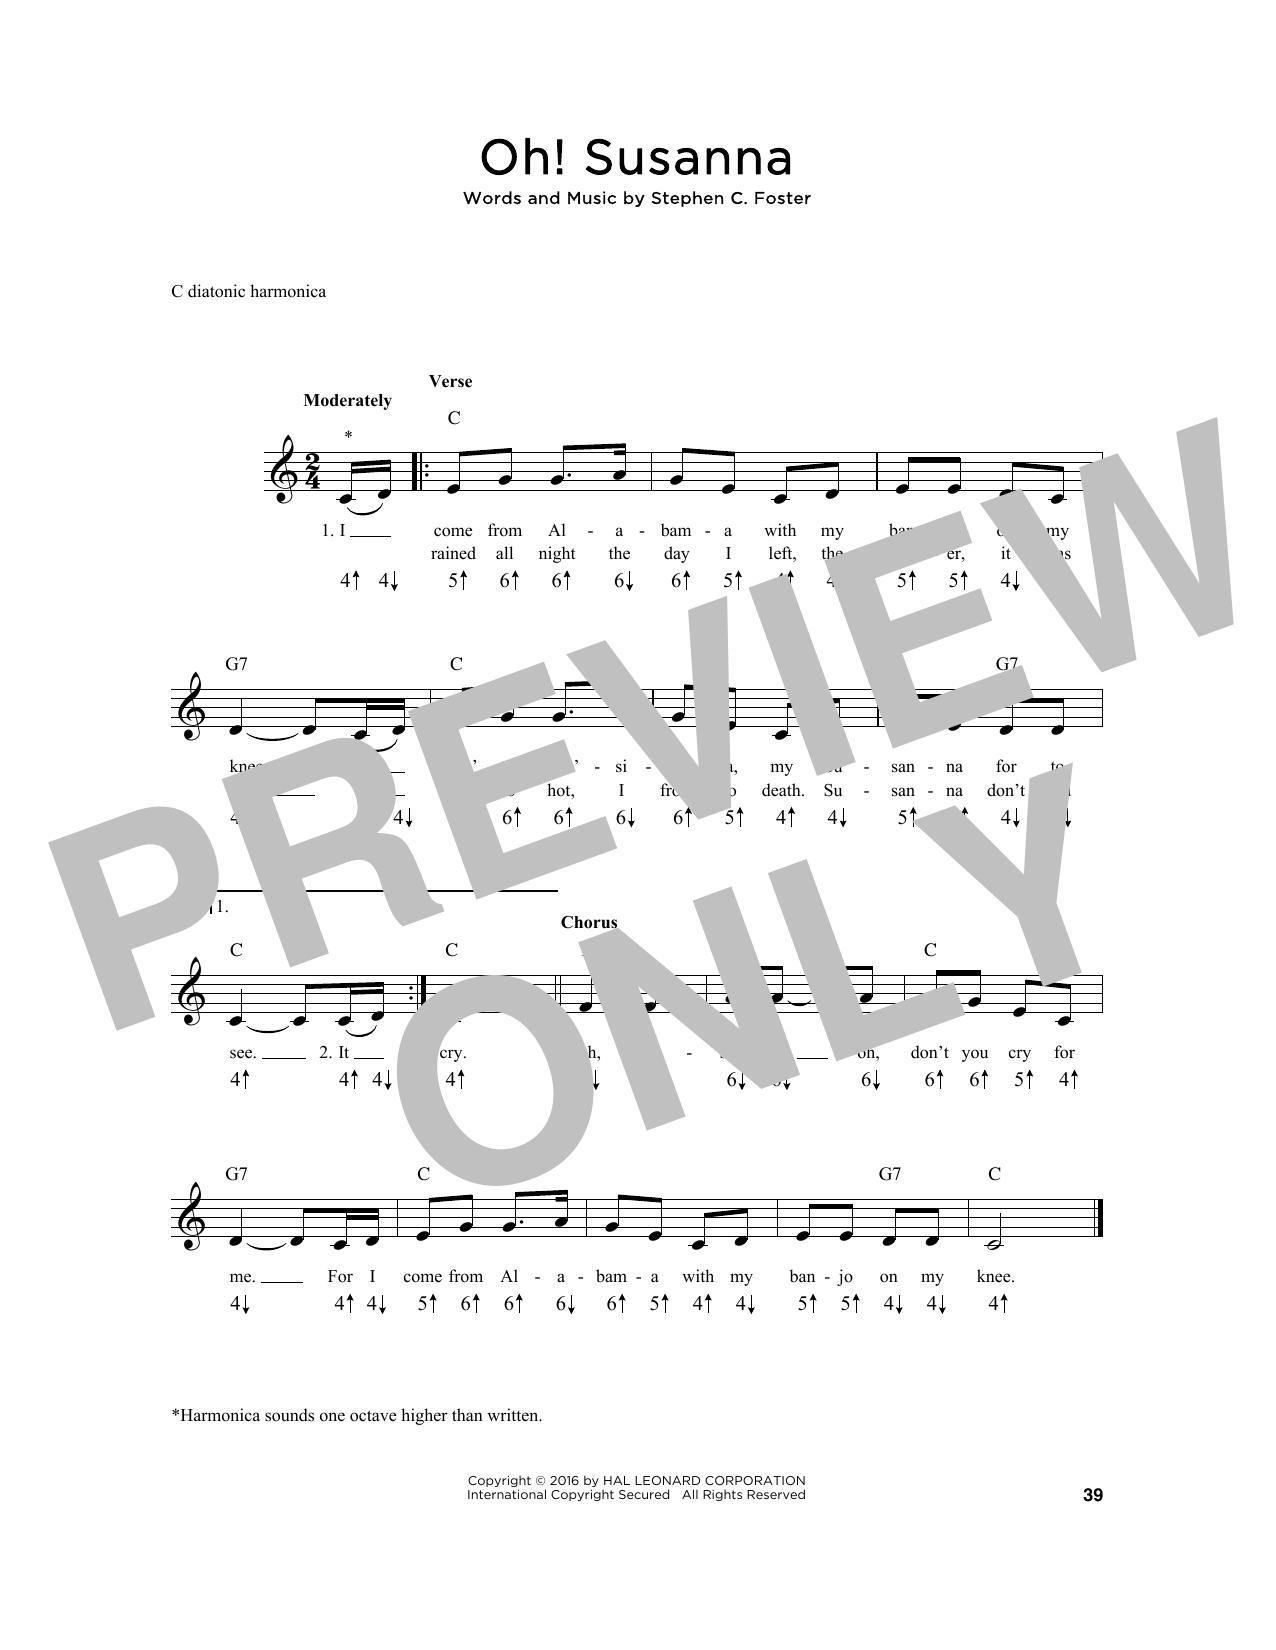 Oh! Susanna Sheet Music